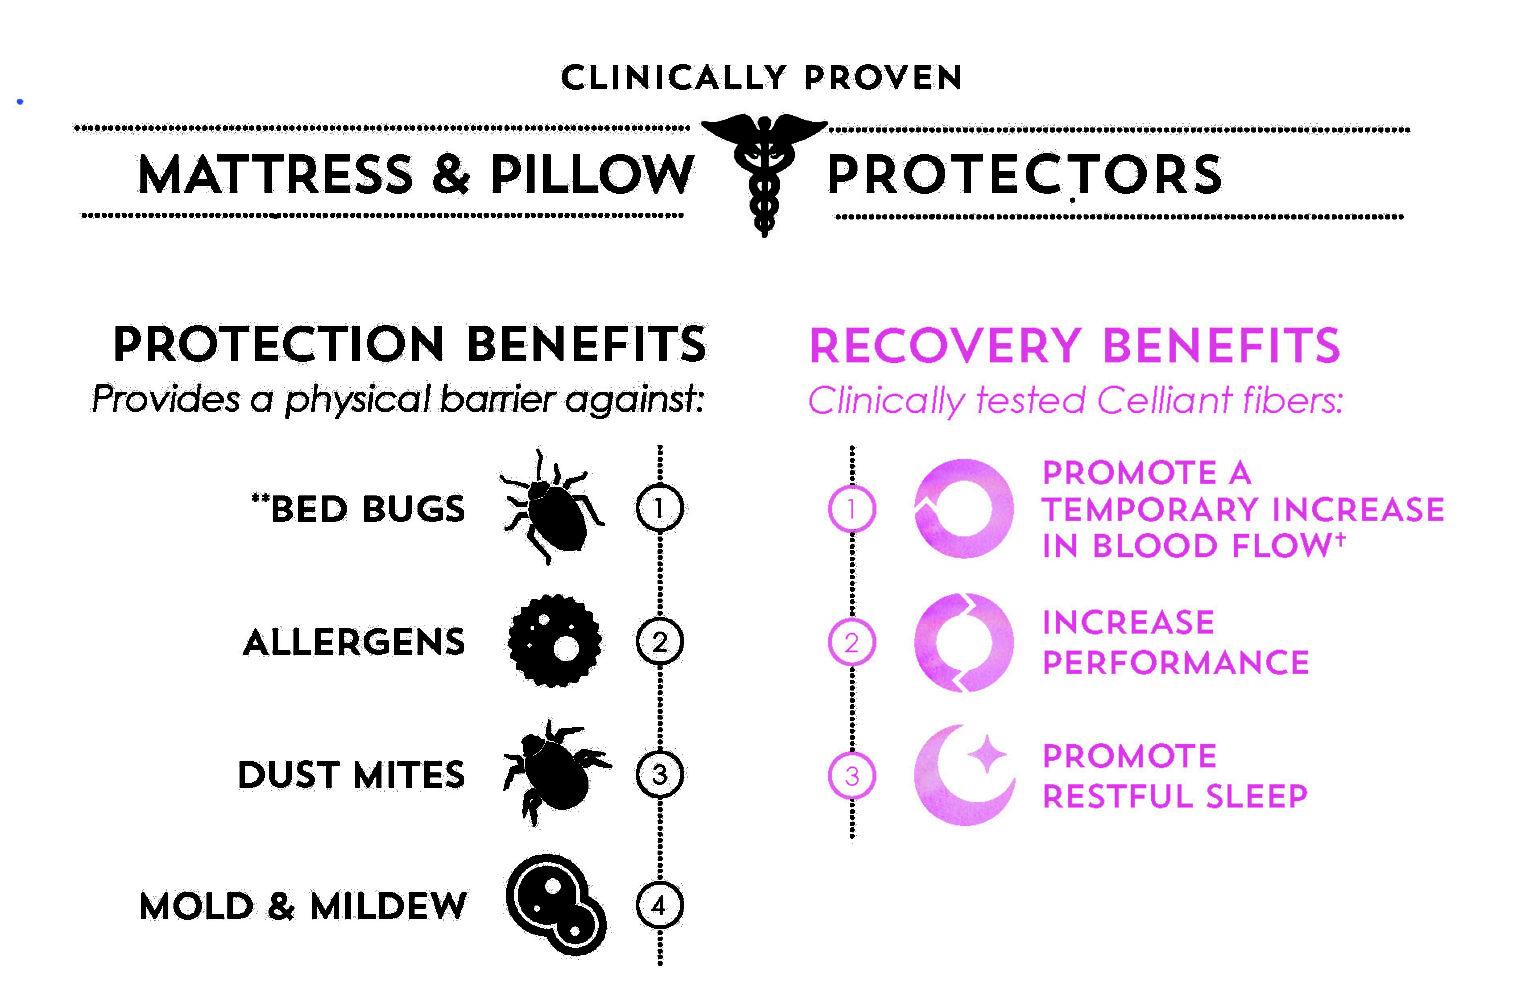 PureCare mattress and pillow protector benefits